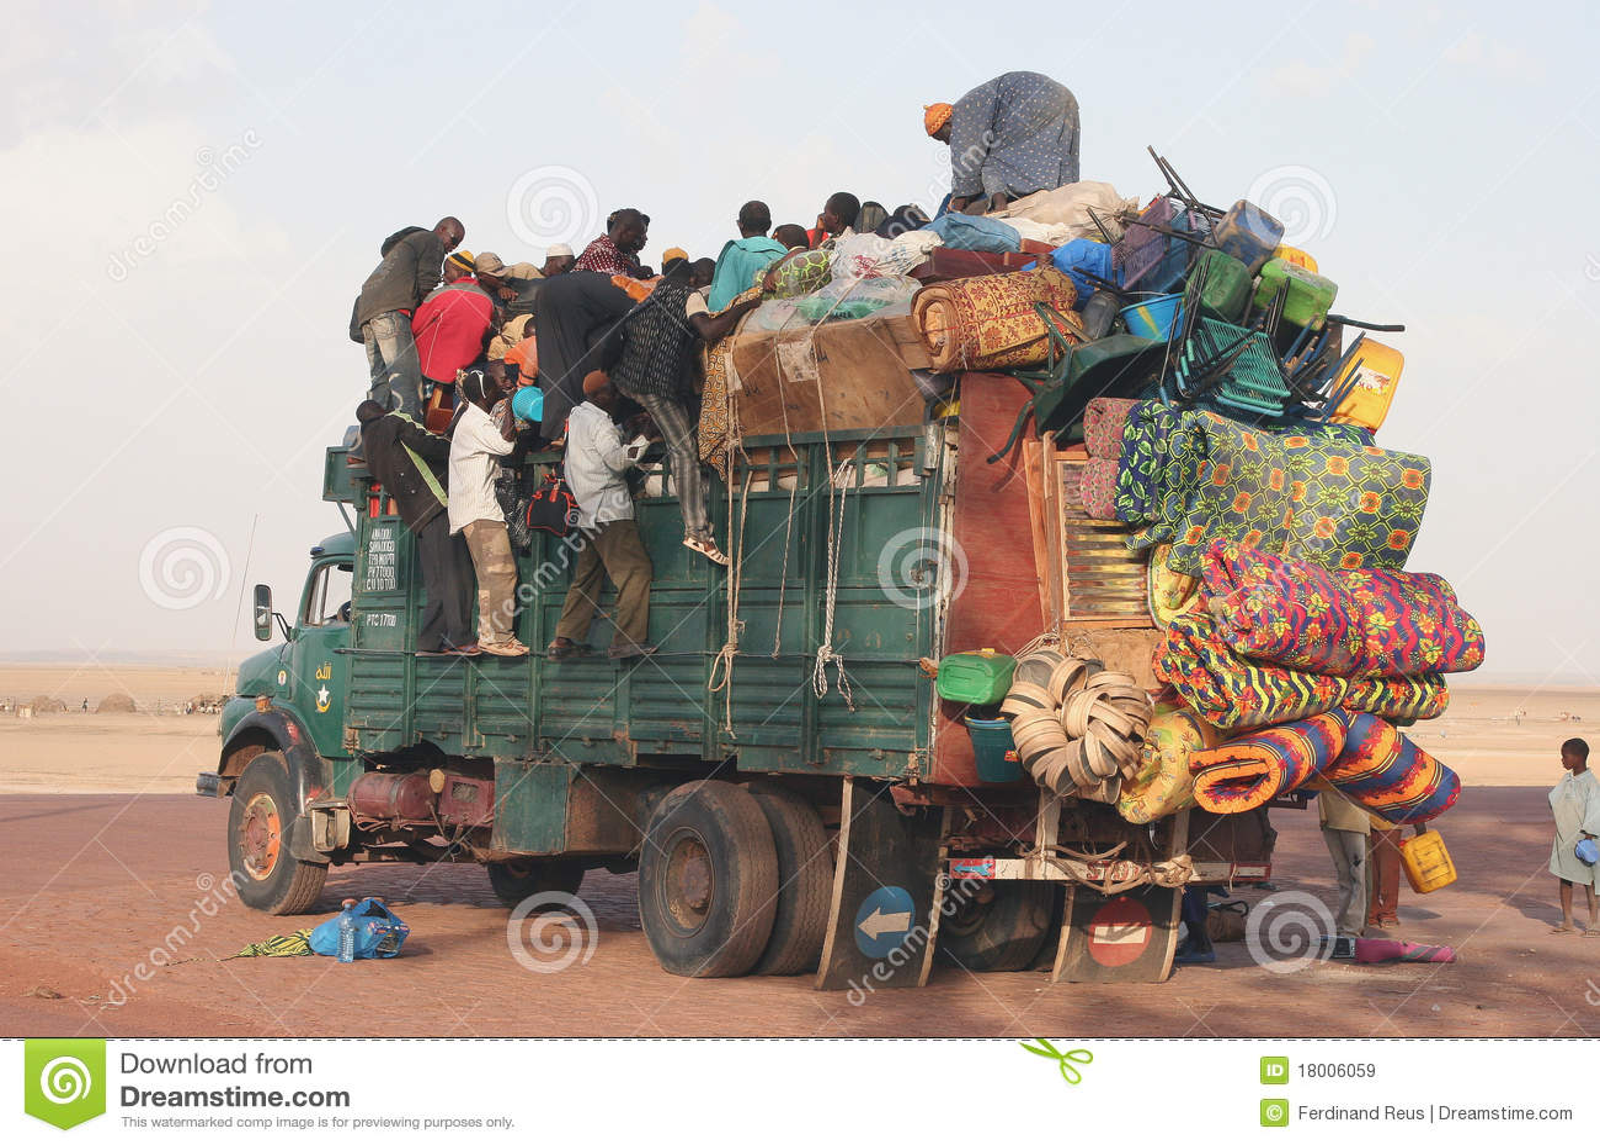 Africa transport